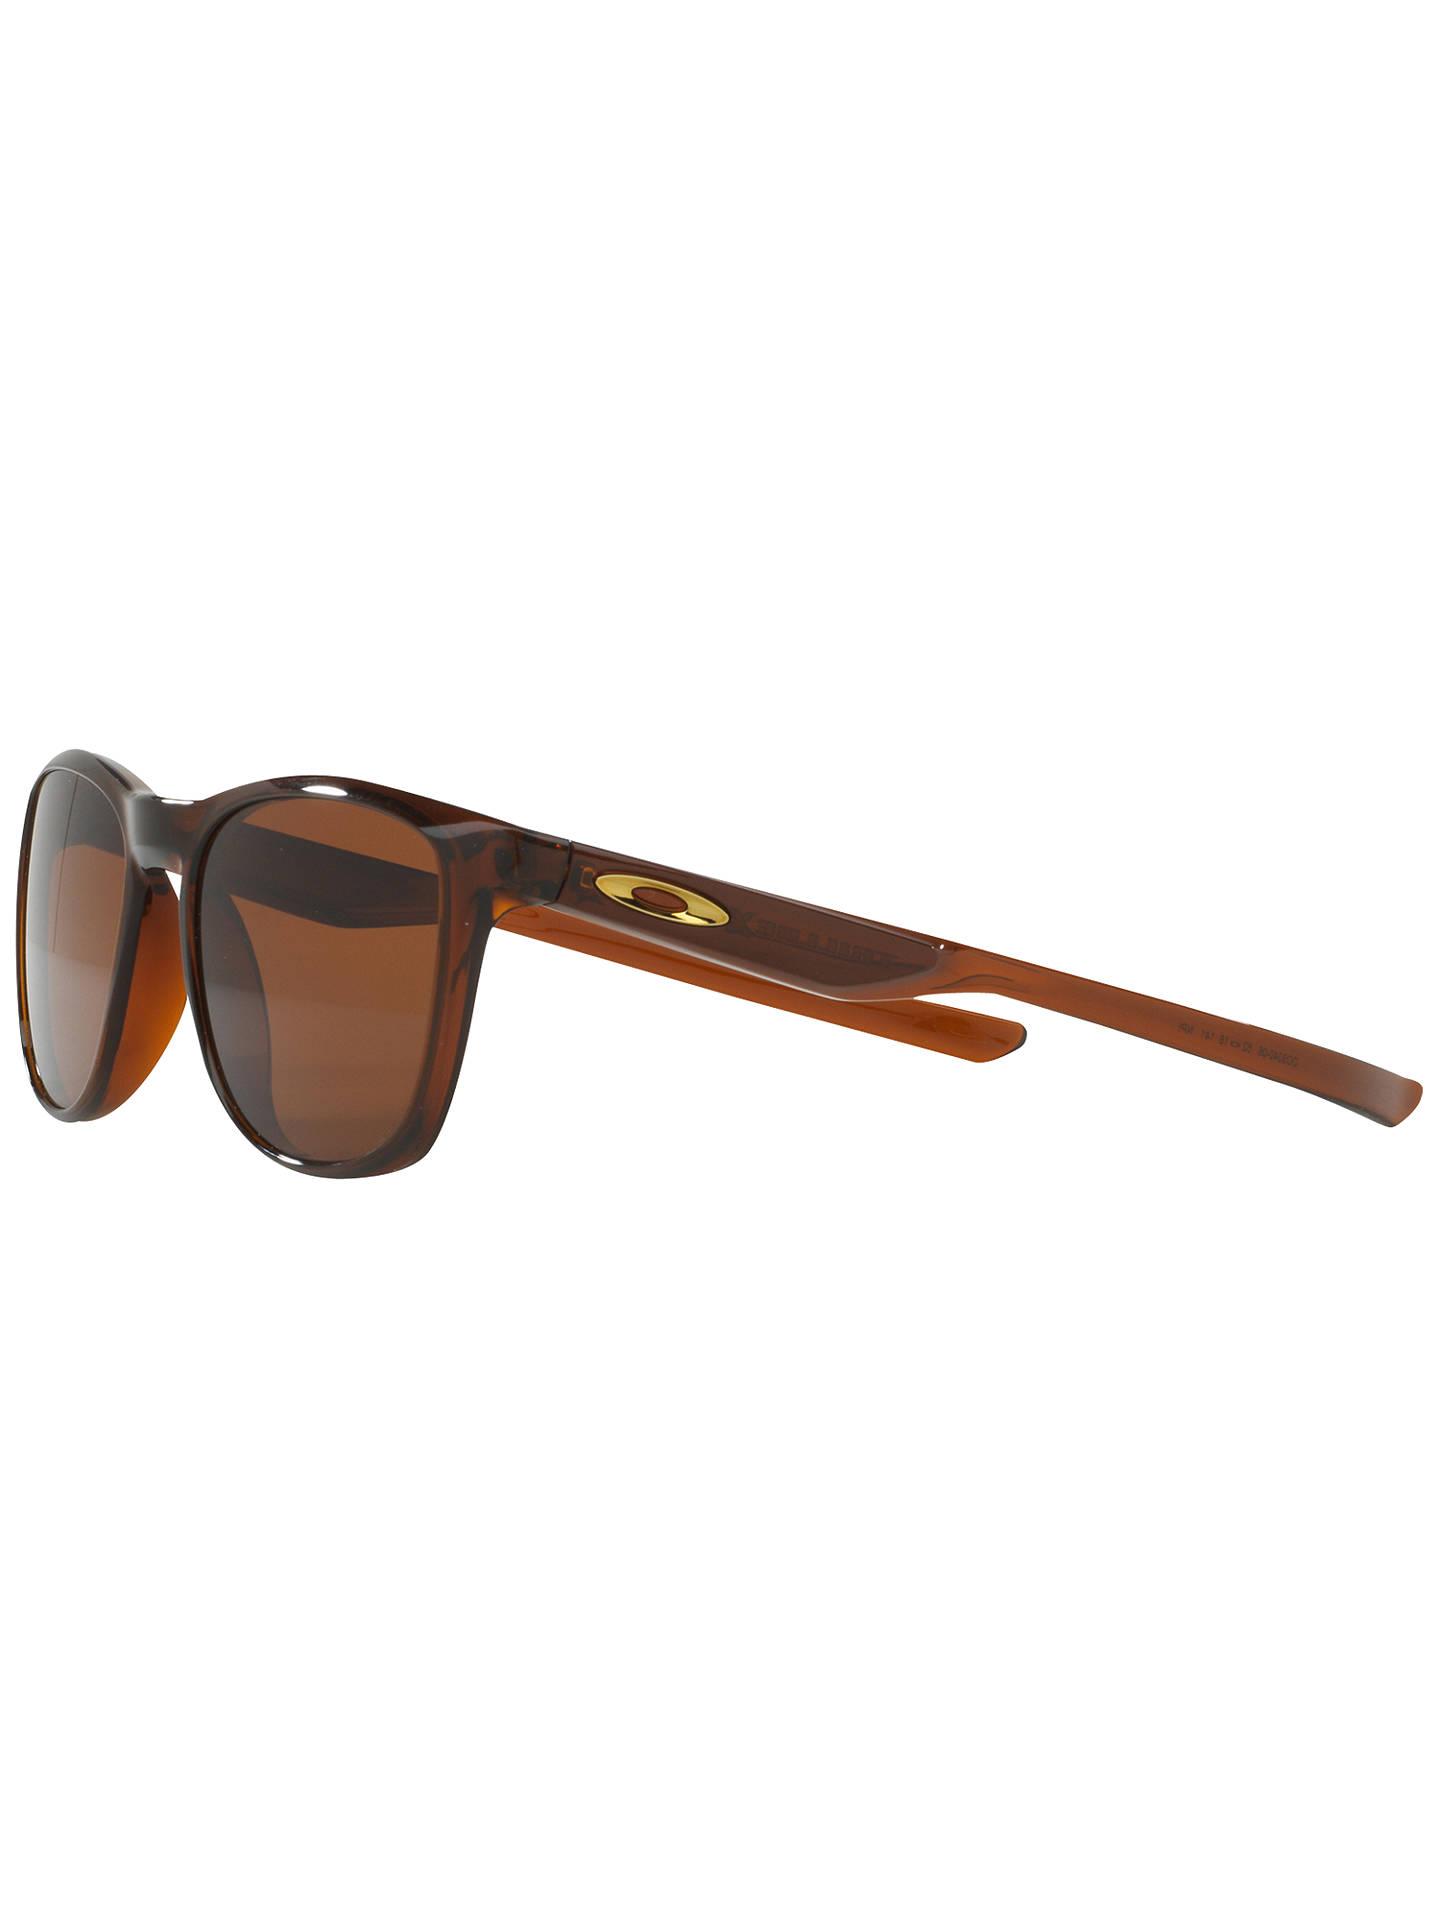 cf071f455d Oakley OO9340 Trillbe X Square Sunglasses at John Lewis   Partners